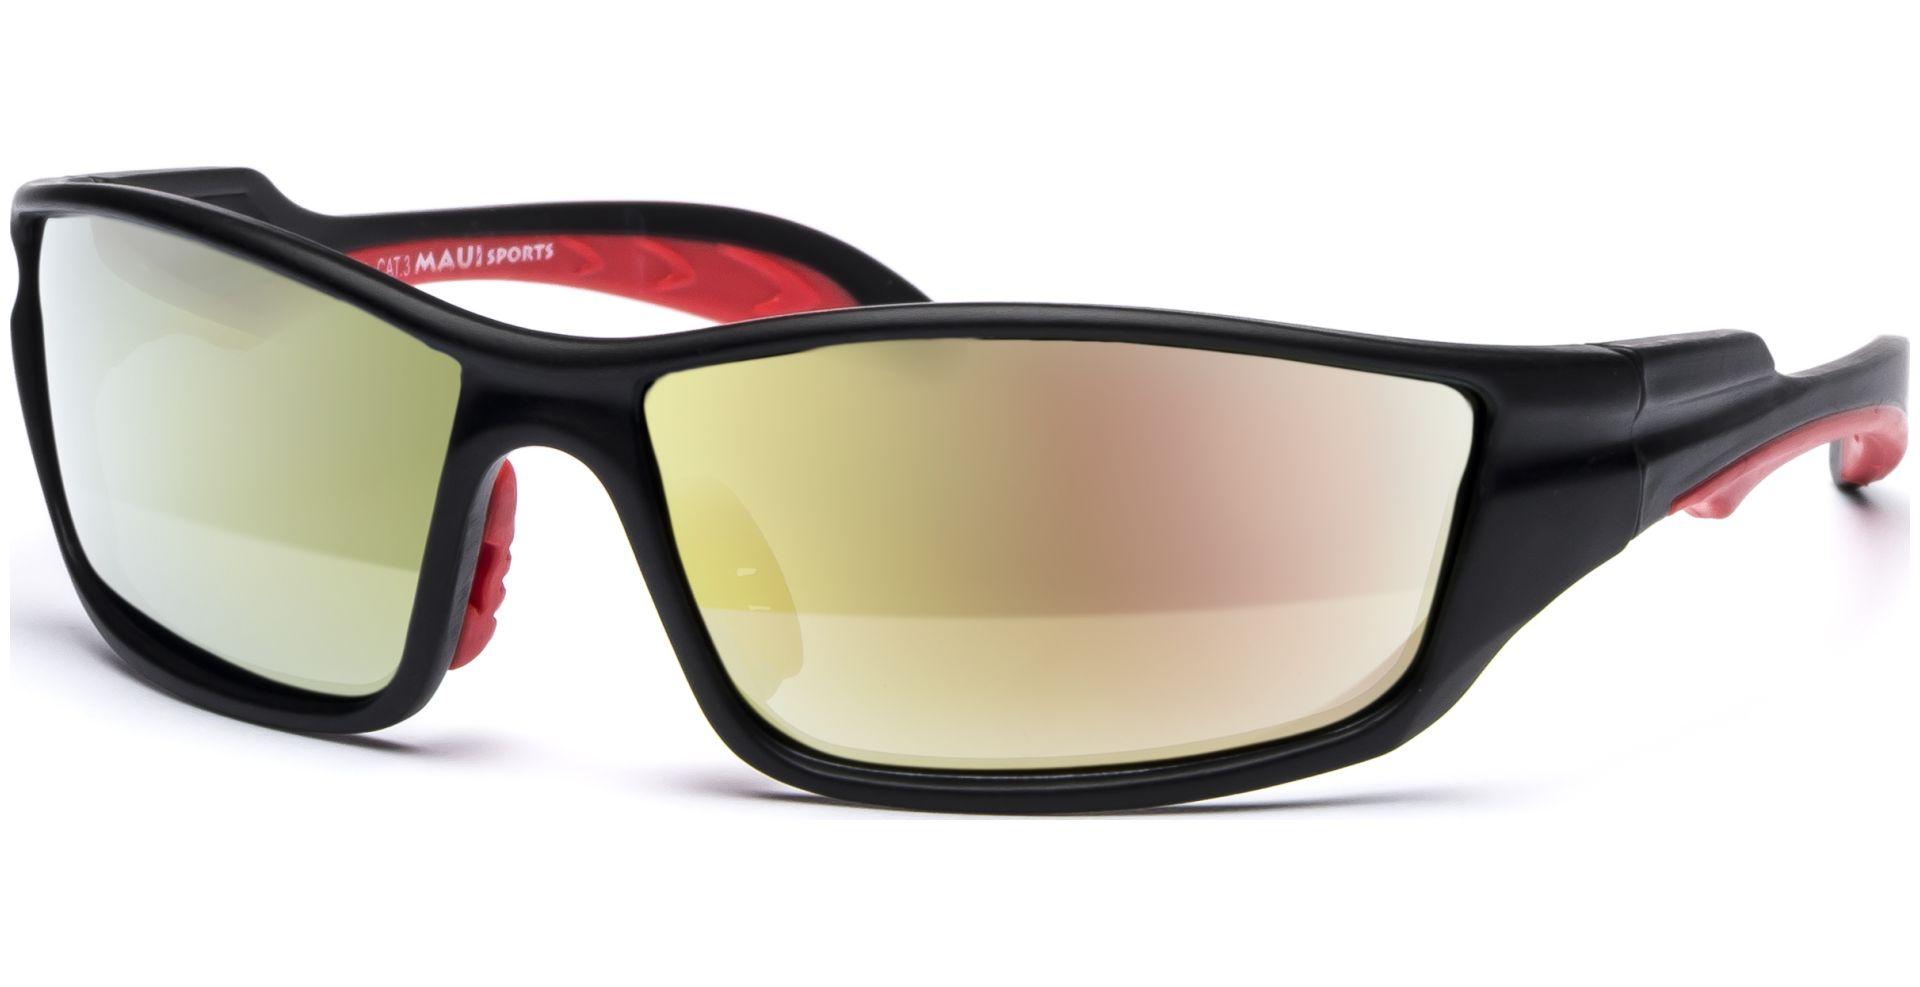 MAUI Sports Polarized Maui Sports Sonnenbrille 6616